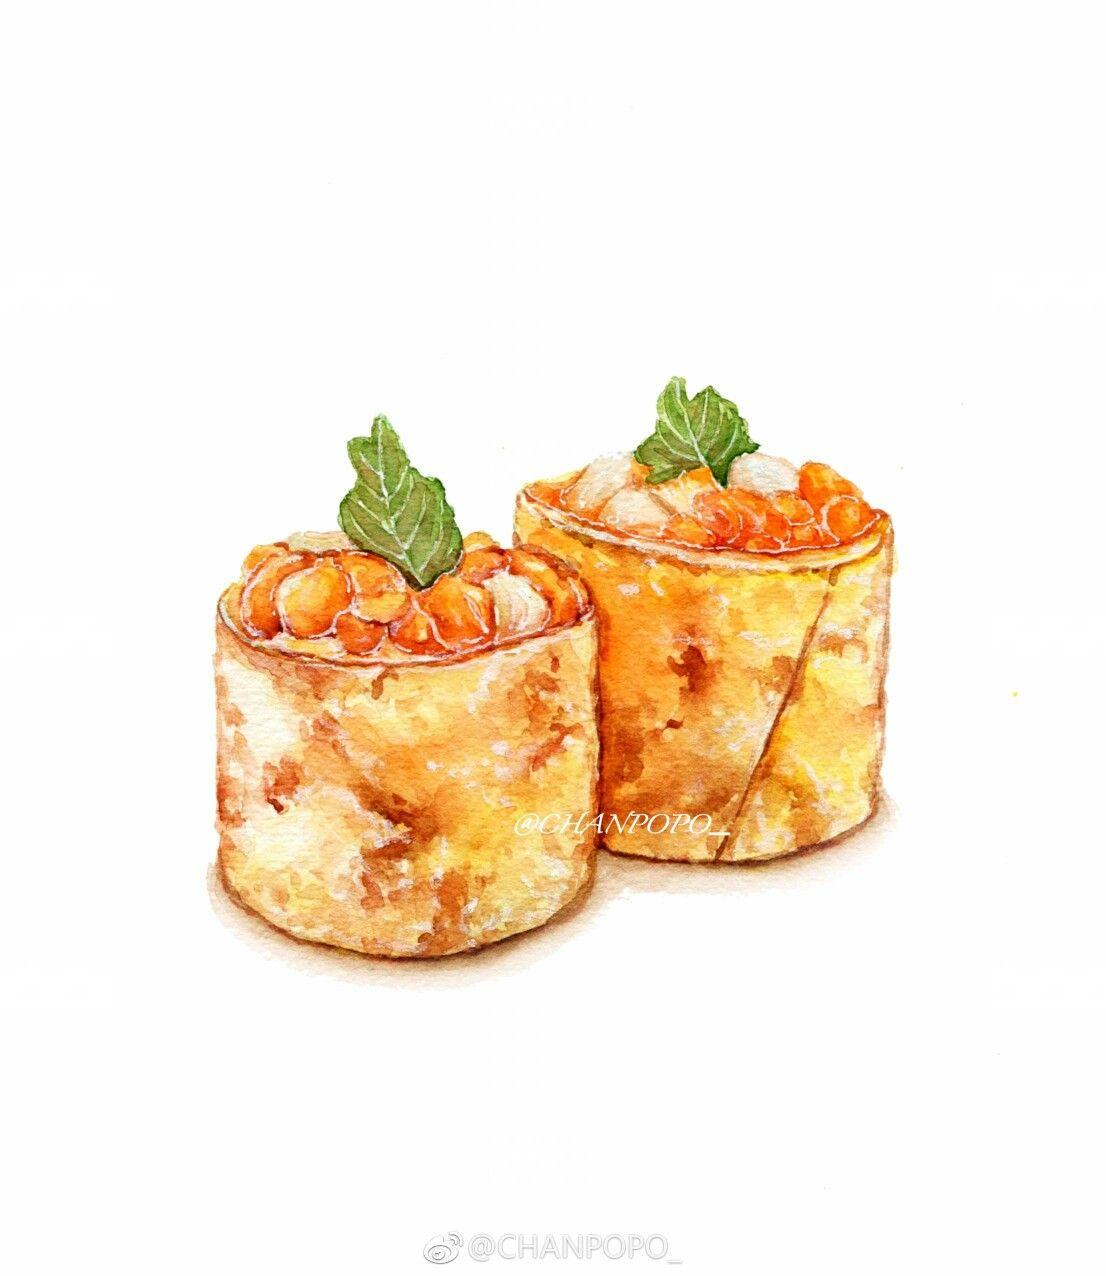 Ghim Của Pricio Lawalata Trên Food, Beverage, And. Chef